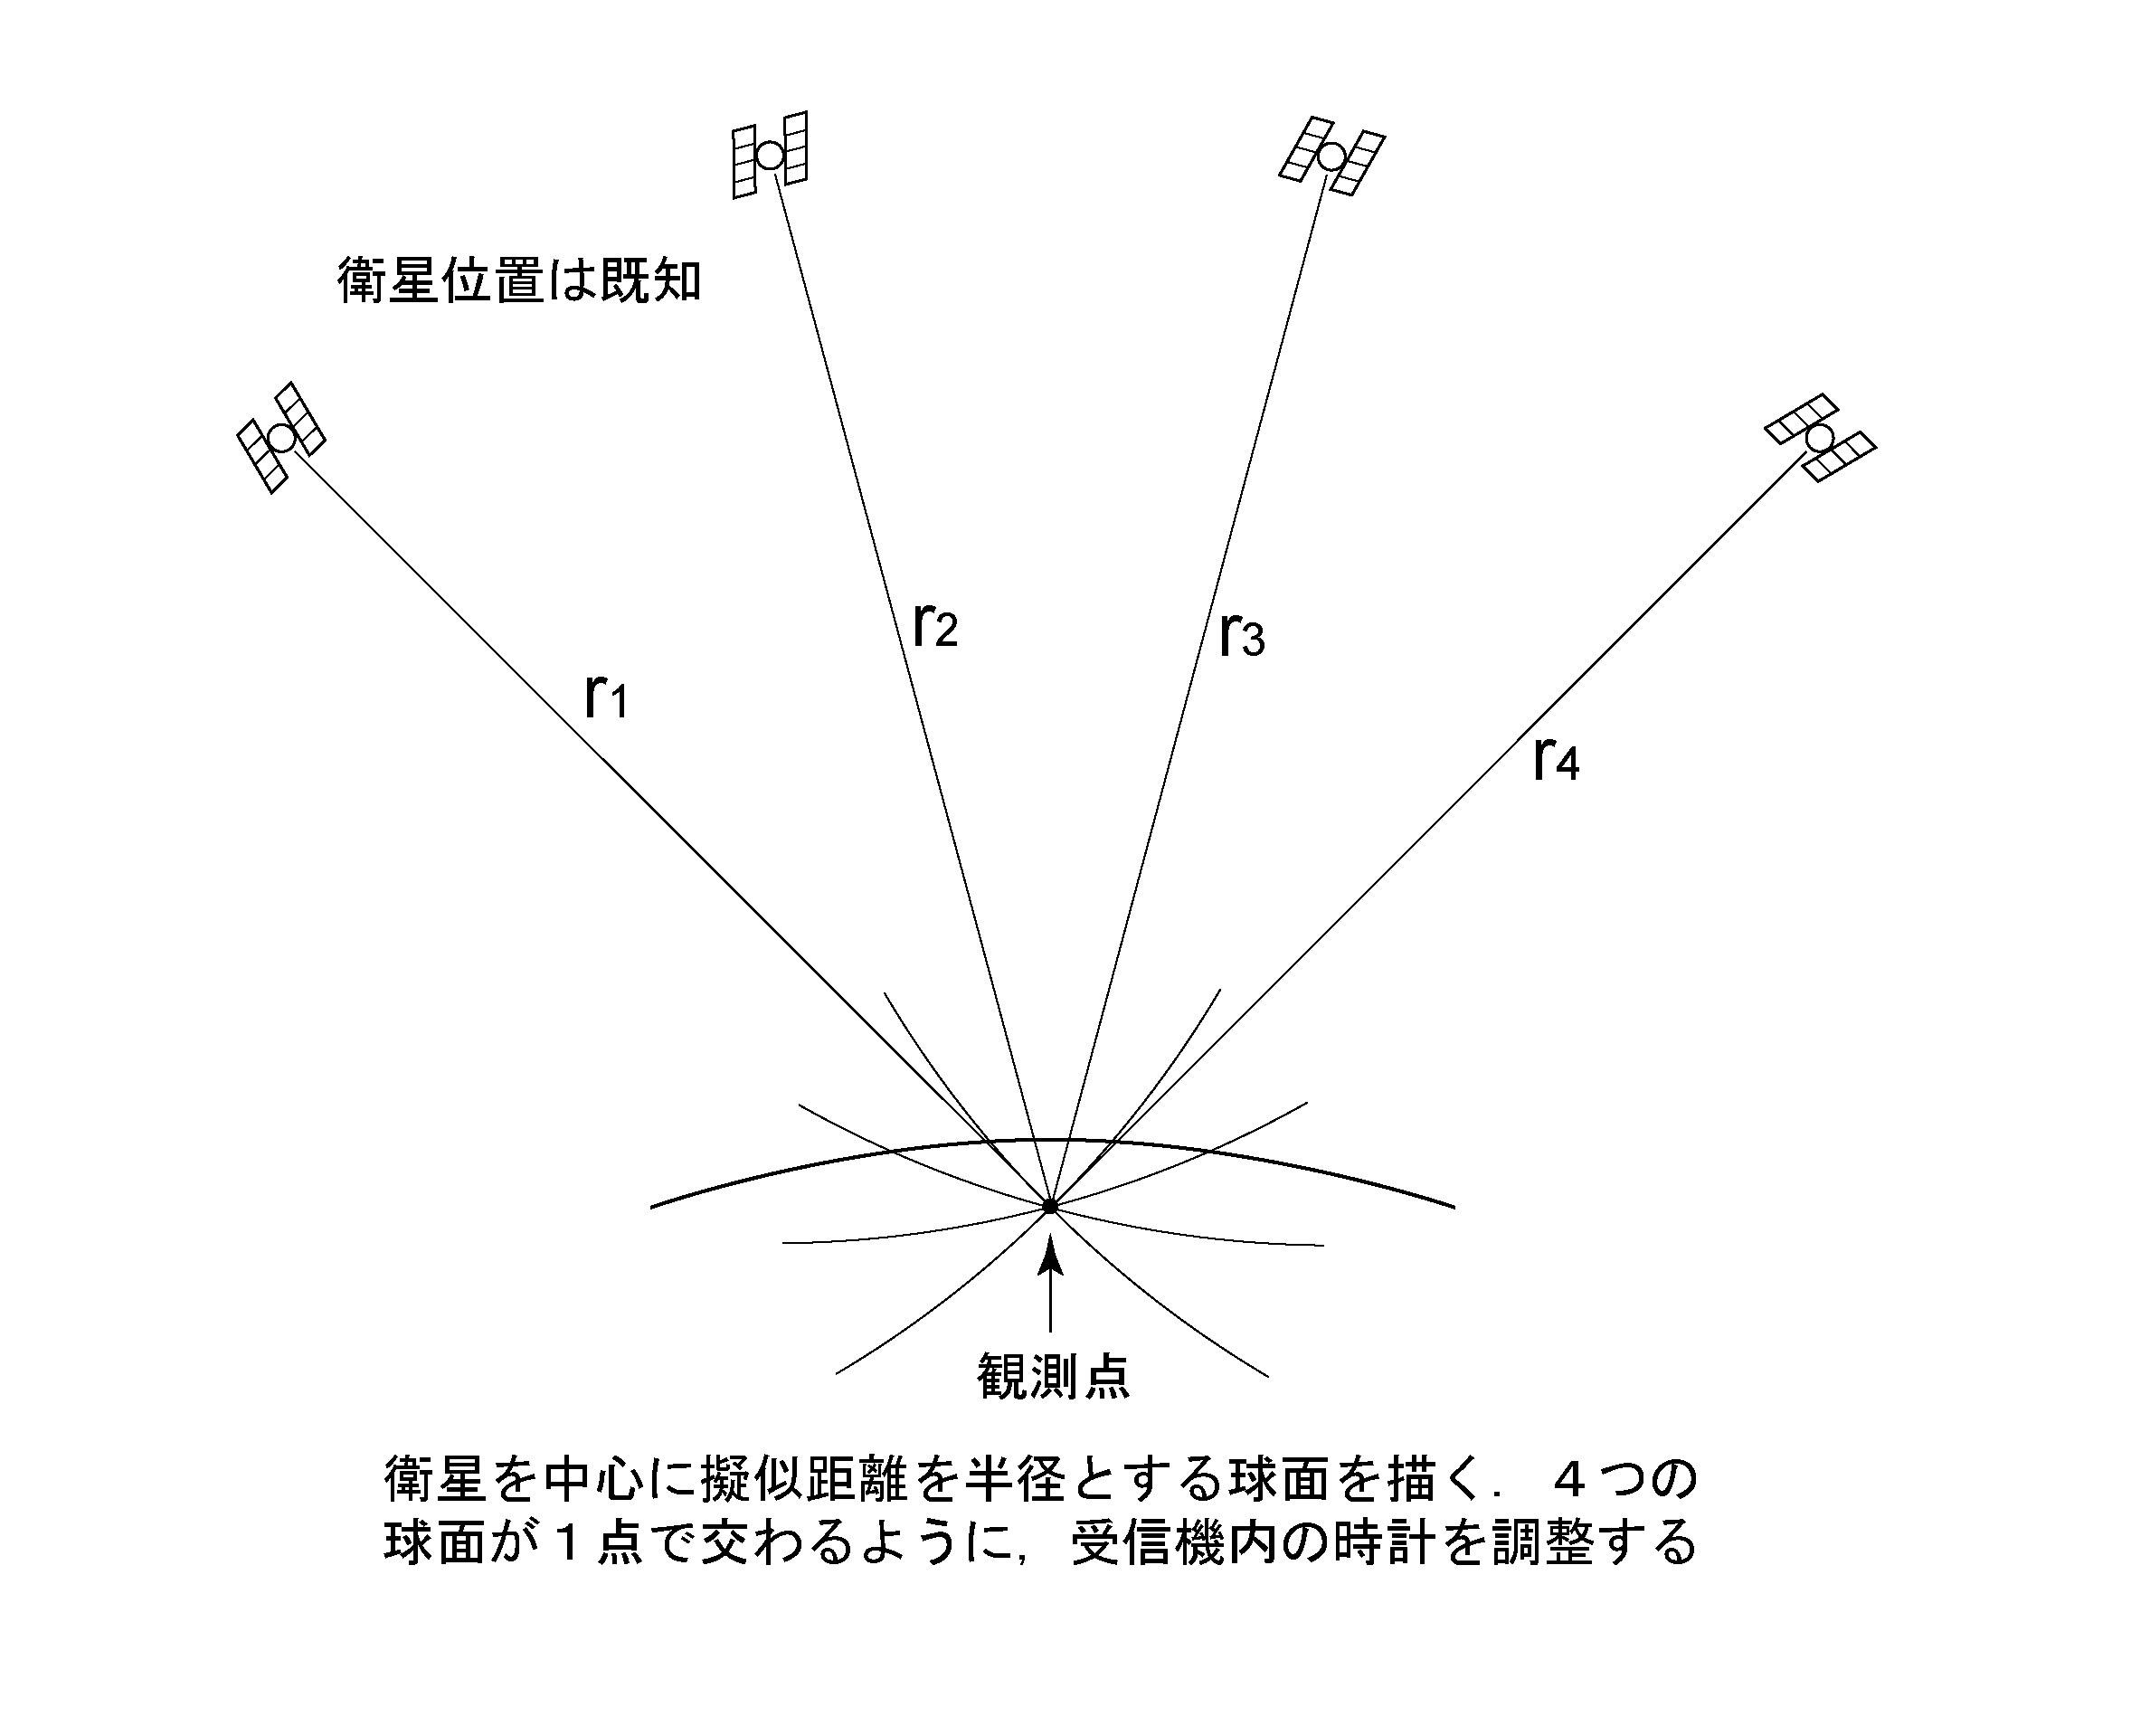 2-4. 地球計測